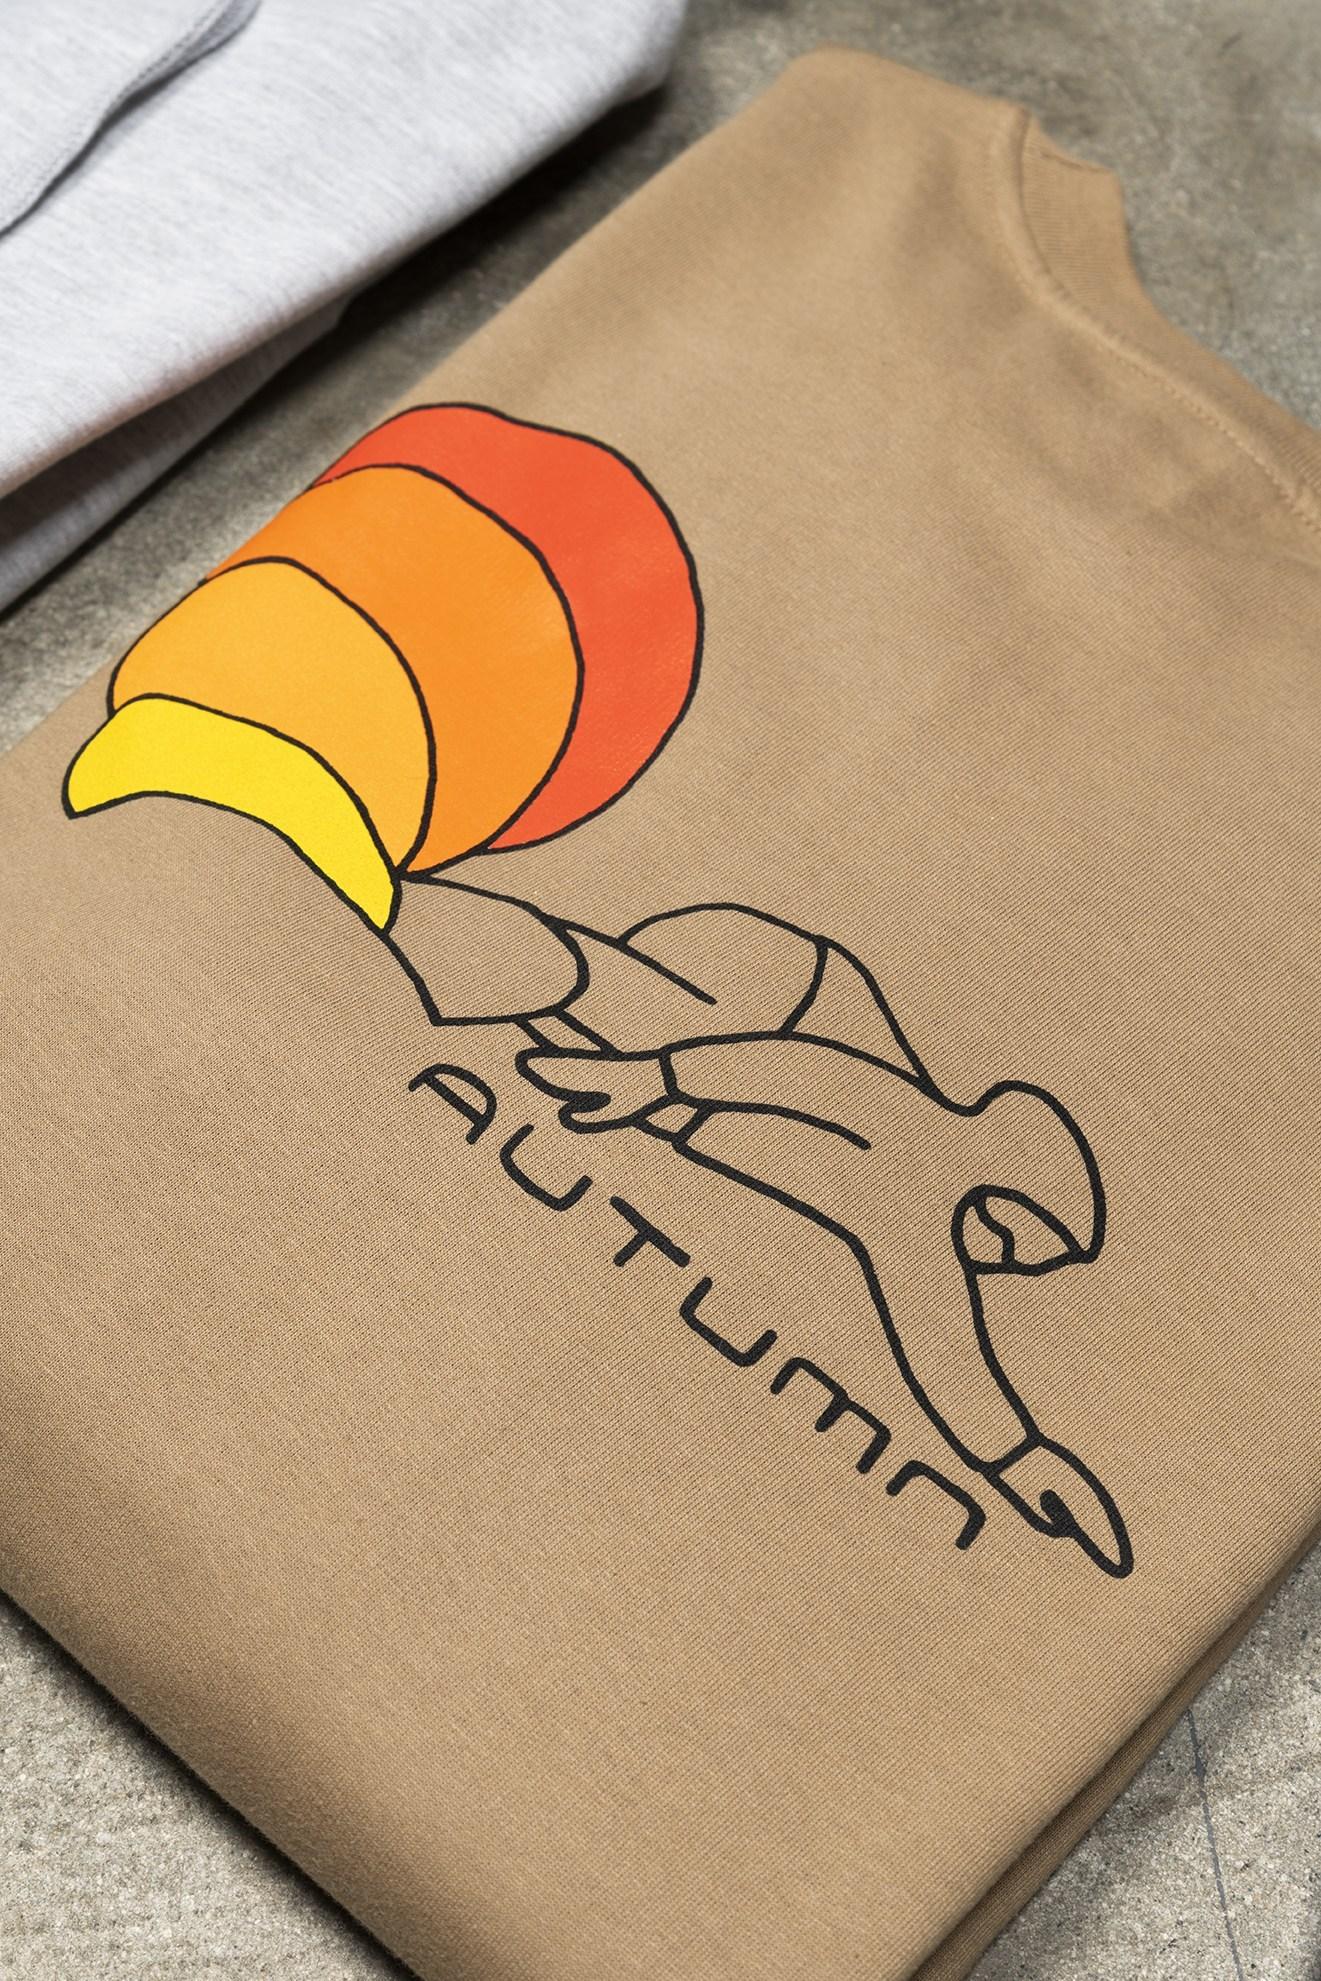 Autumn Headwear Brand Launch